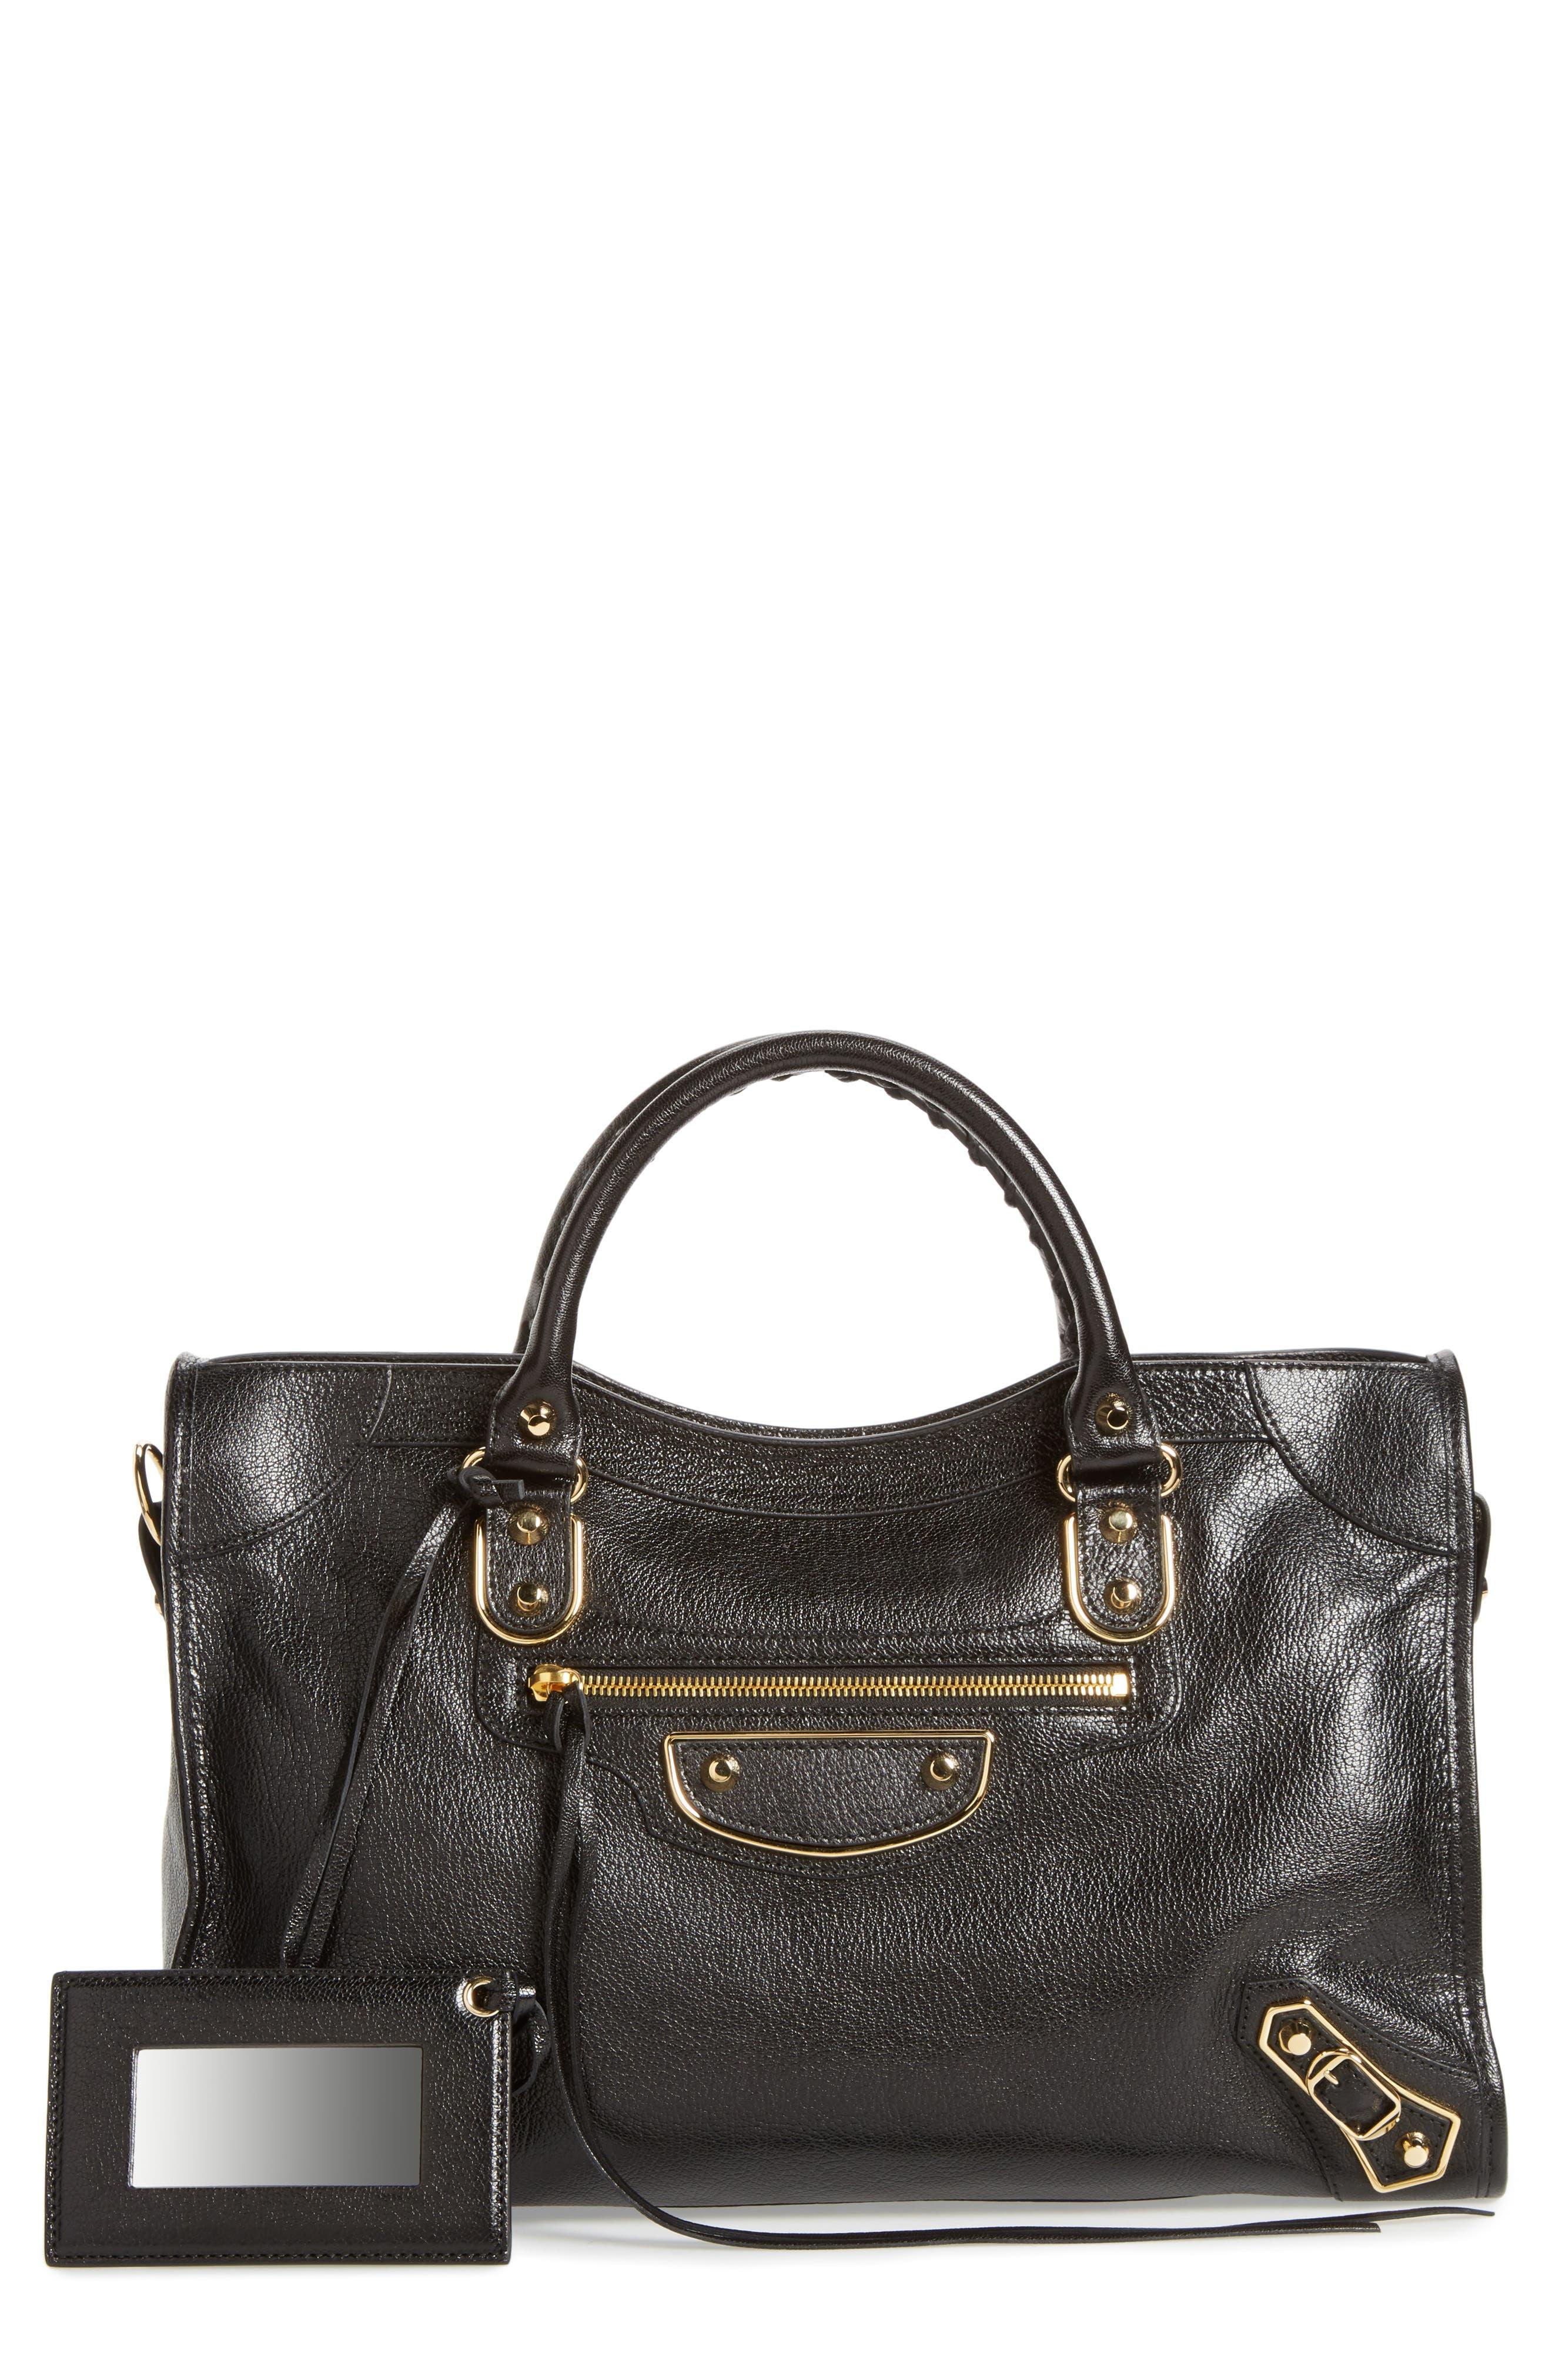 Balenciaga Classic Metallic Edge City Leather Tote